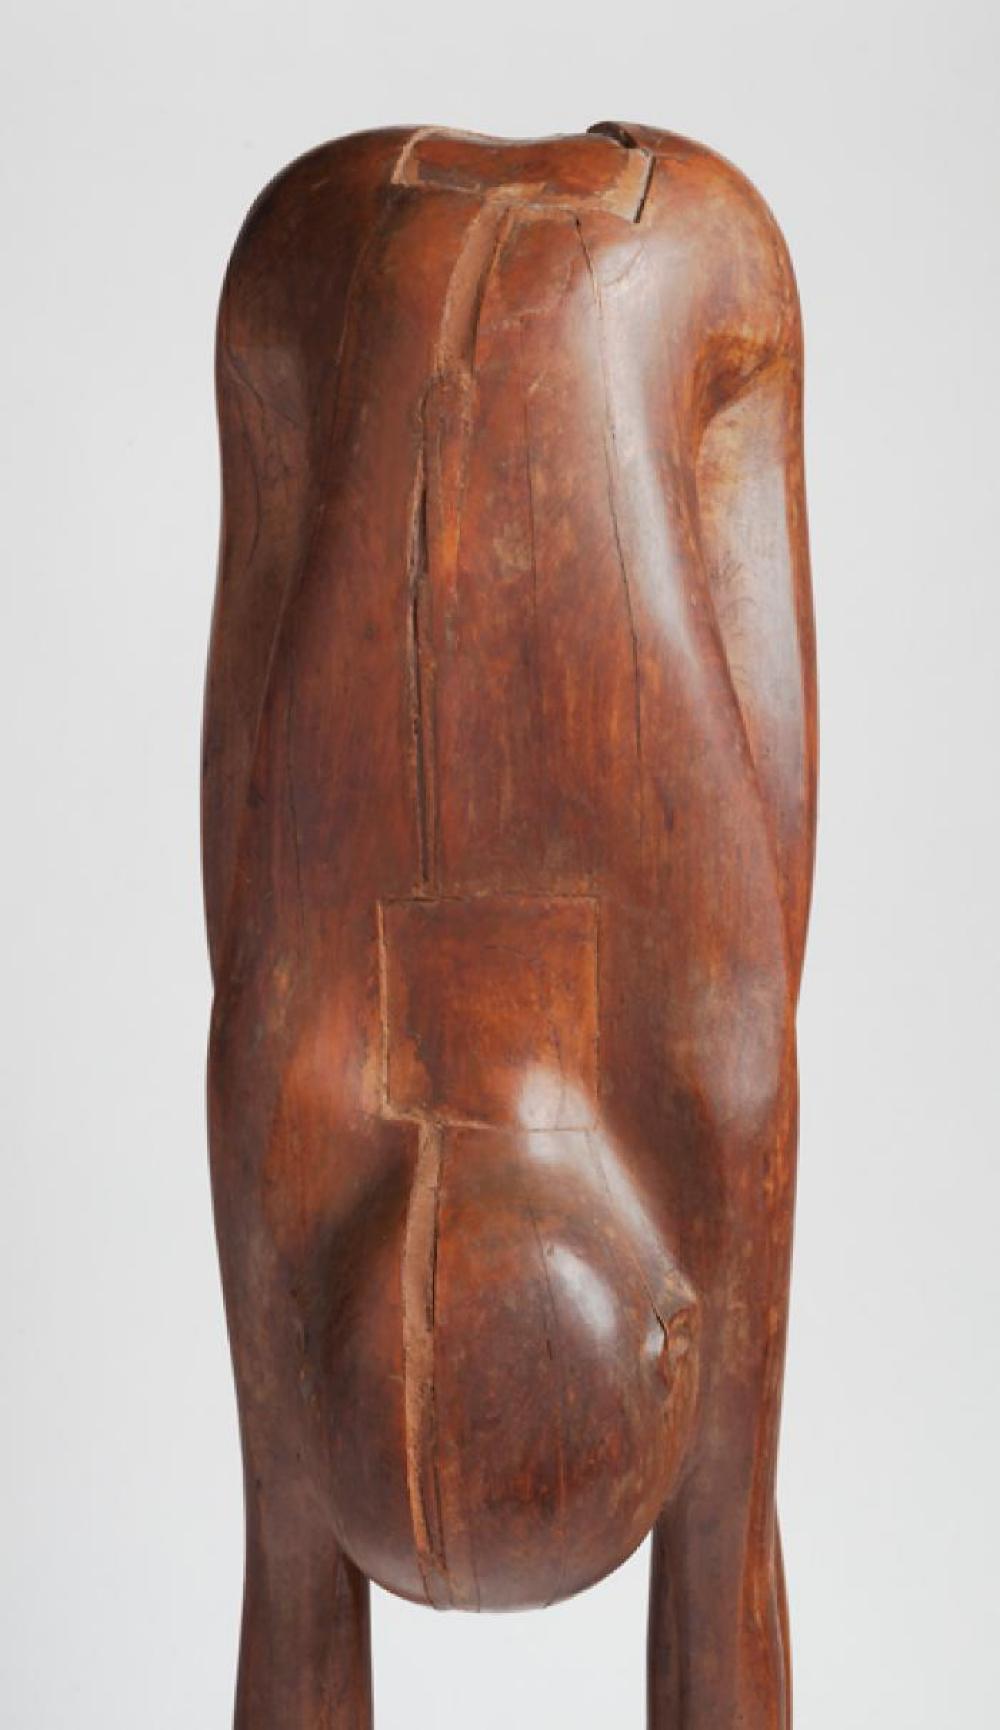 Boy Looking through Legs, image 8